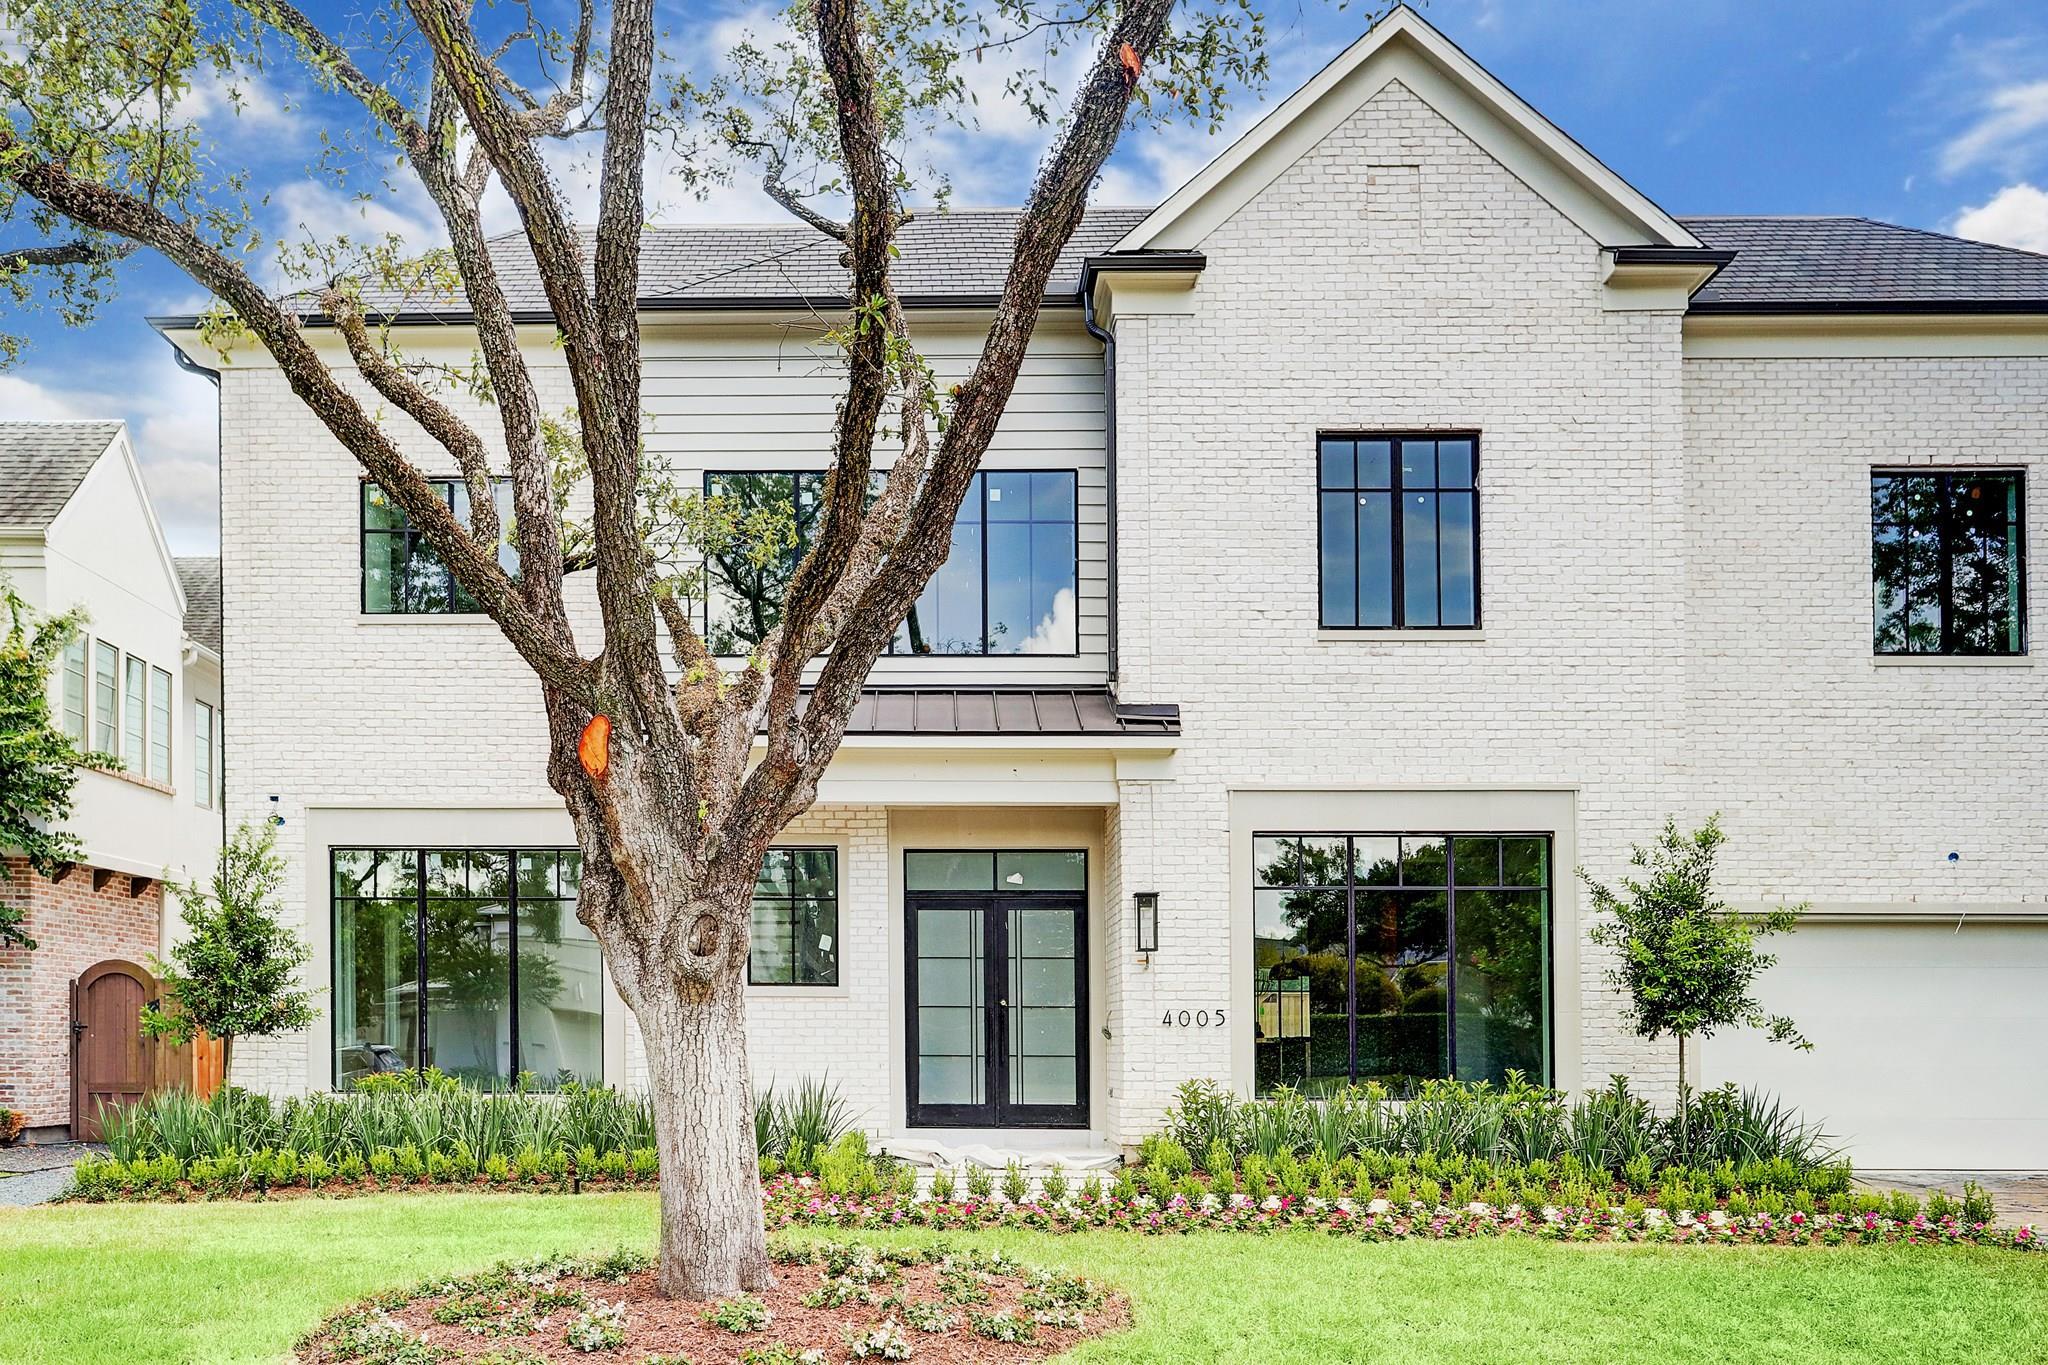 4005 Overbrook Lane Property Photo - Houston, TX real estate listing